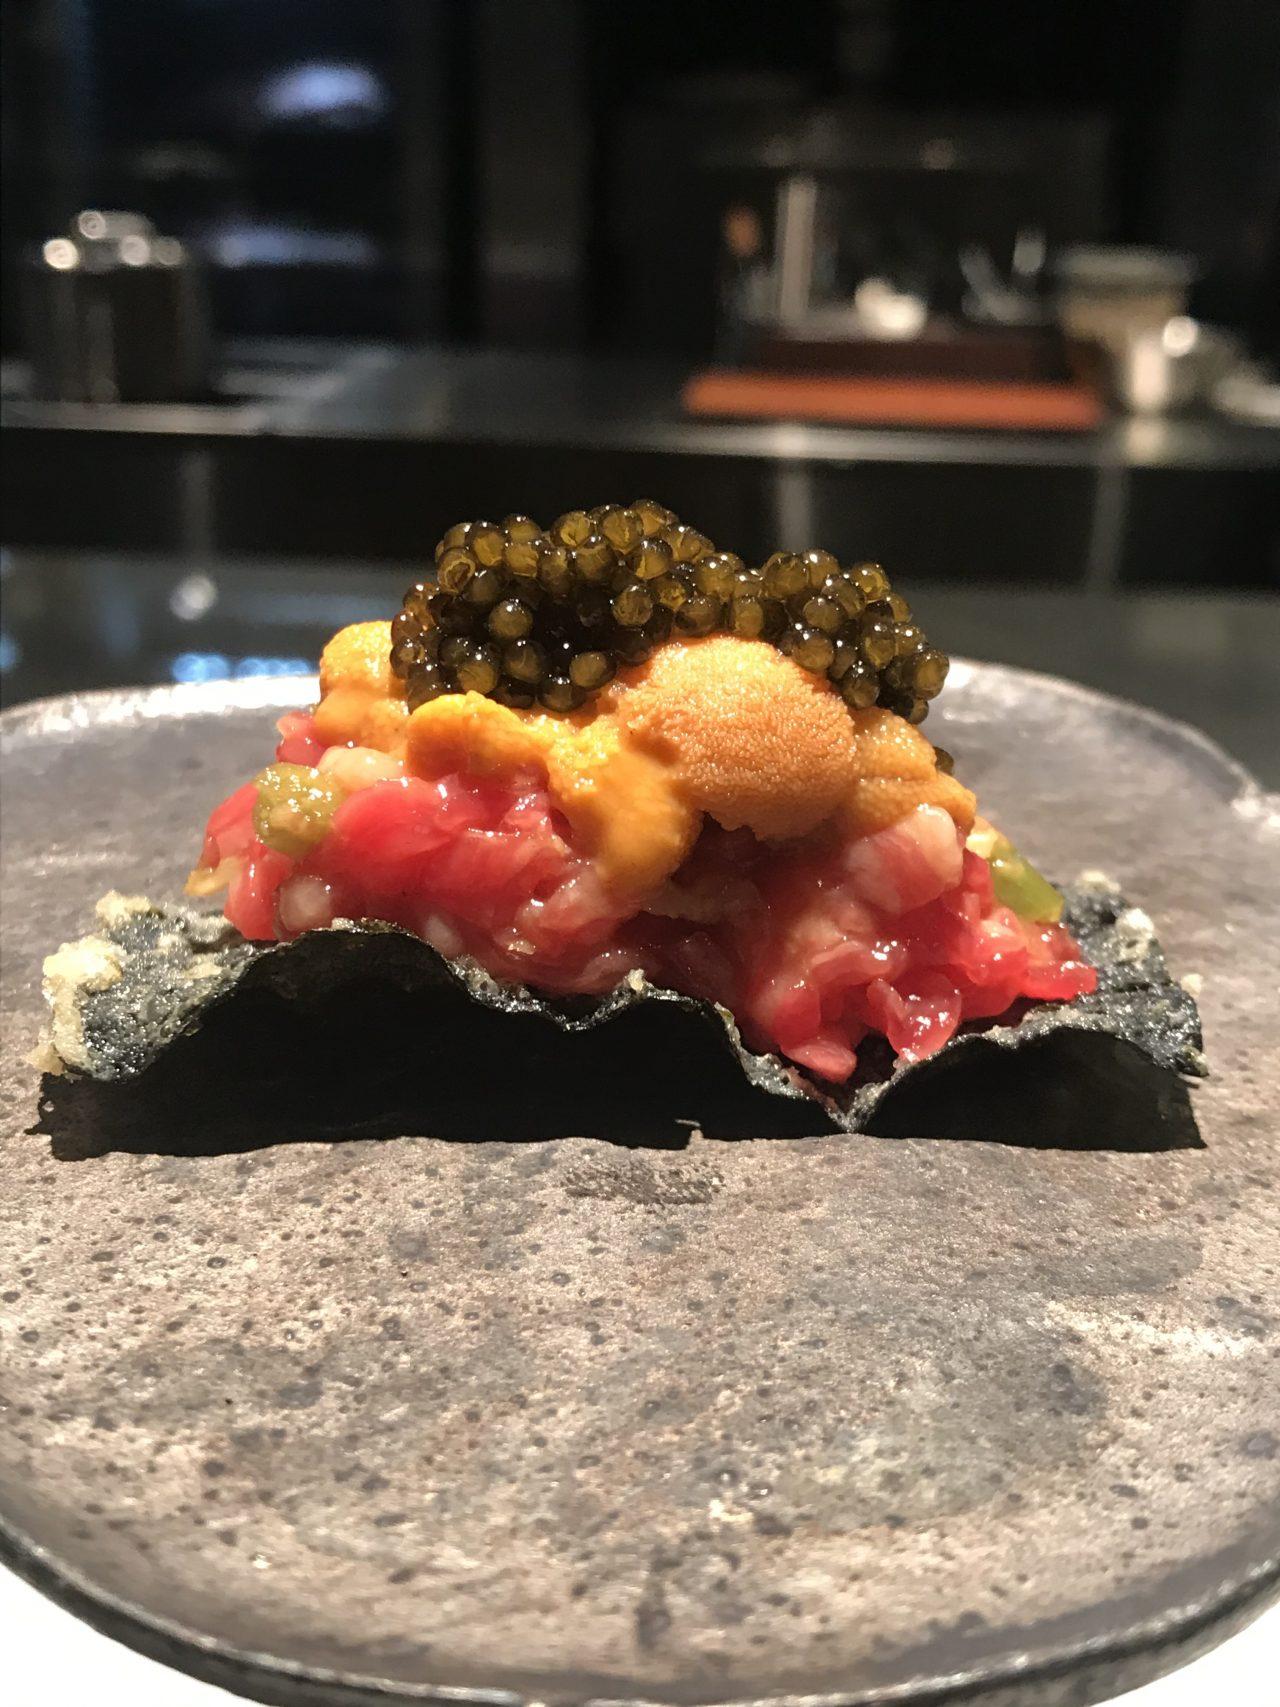 wagyu-tartare-with-uni-and-caviar-1280x1707.jpg